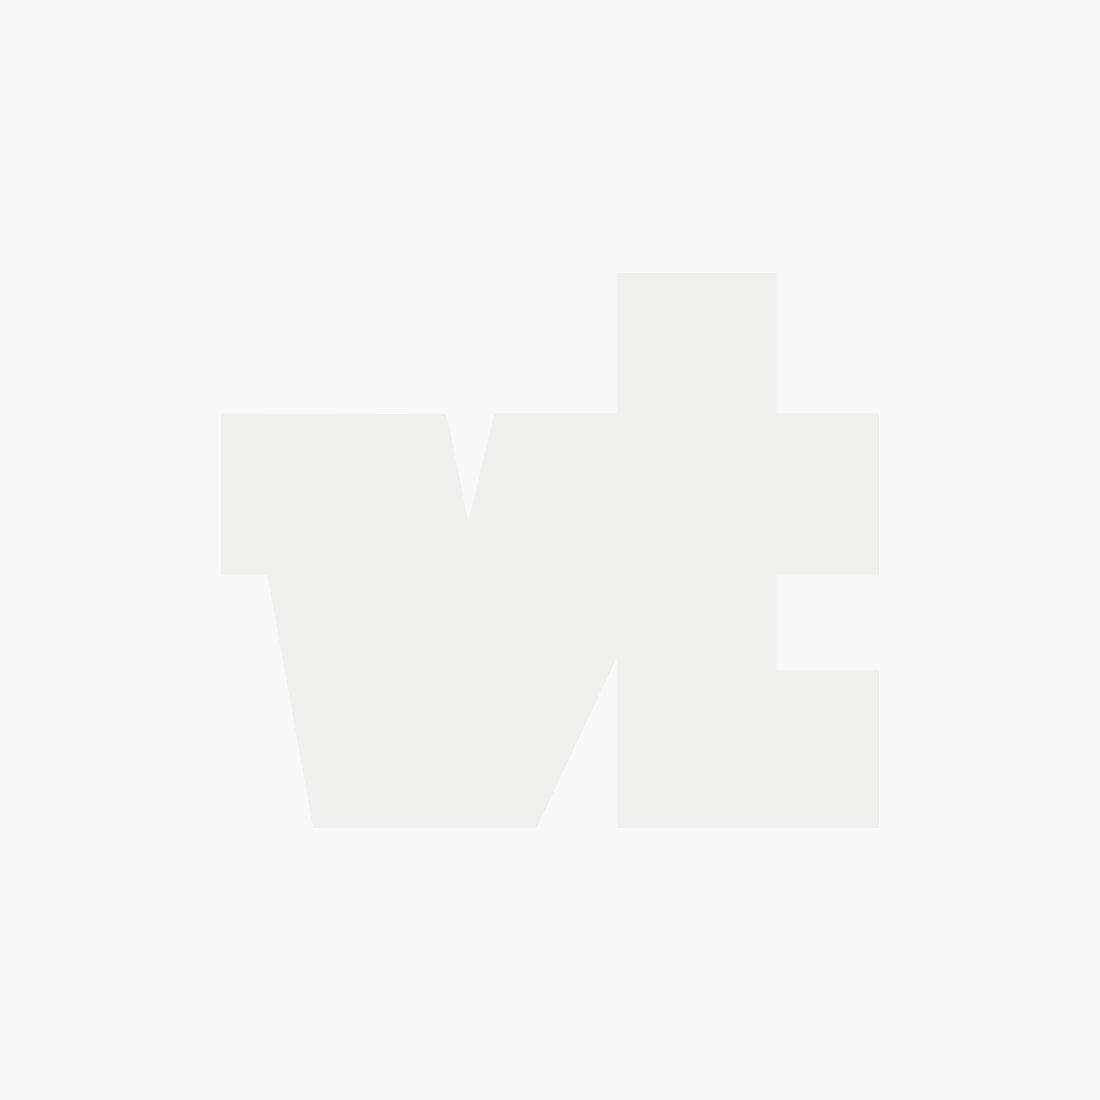 Karl seersucker mandarin shirt dark navy